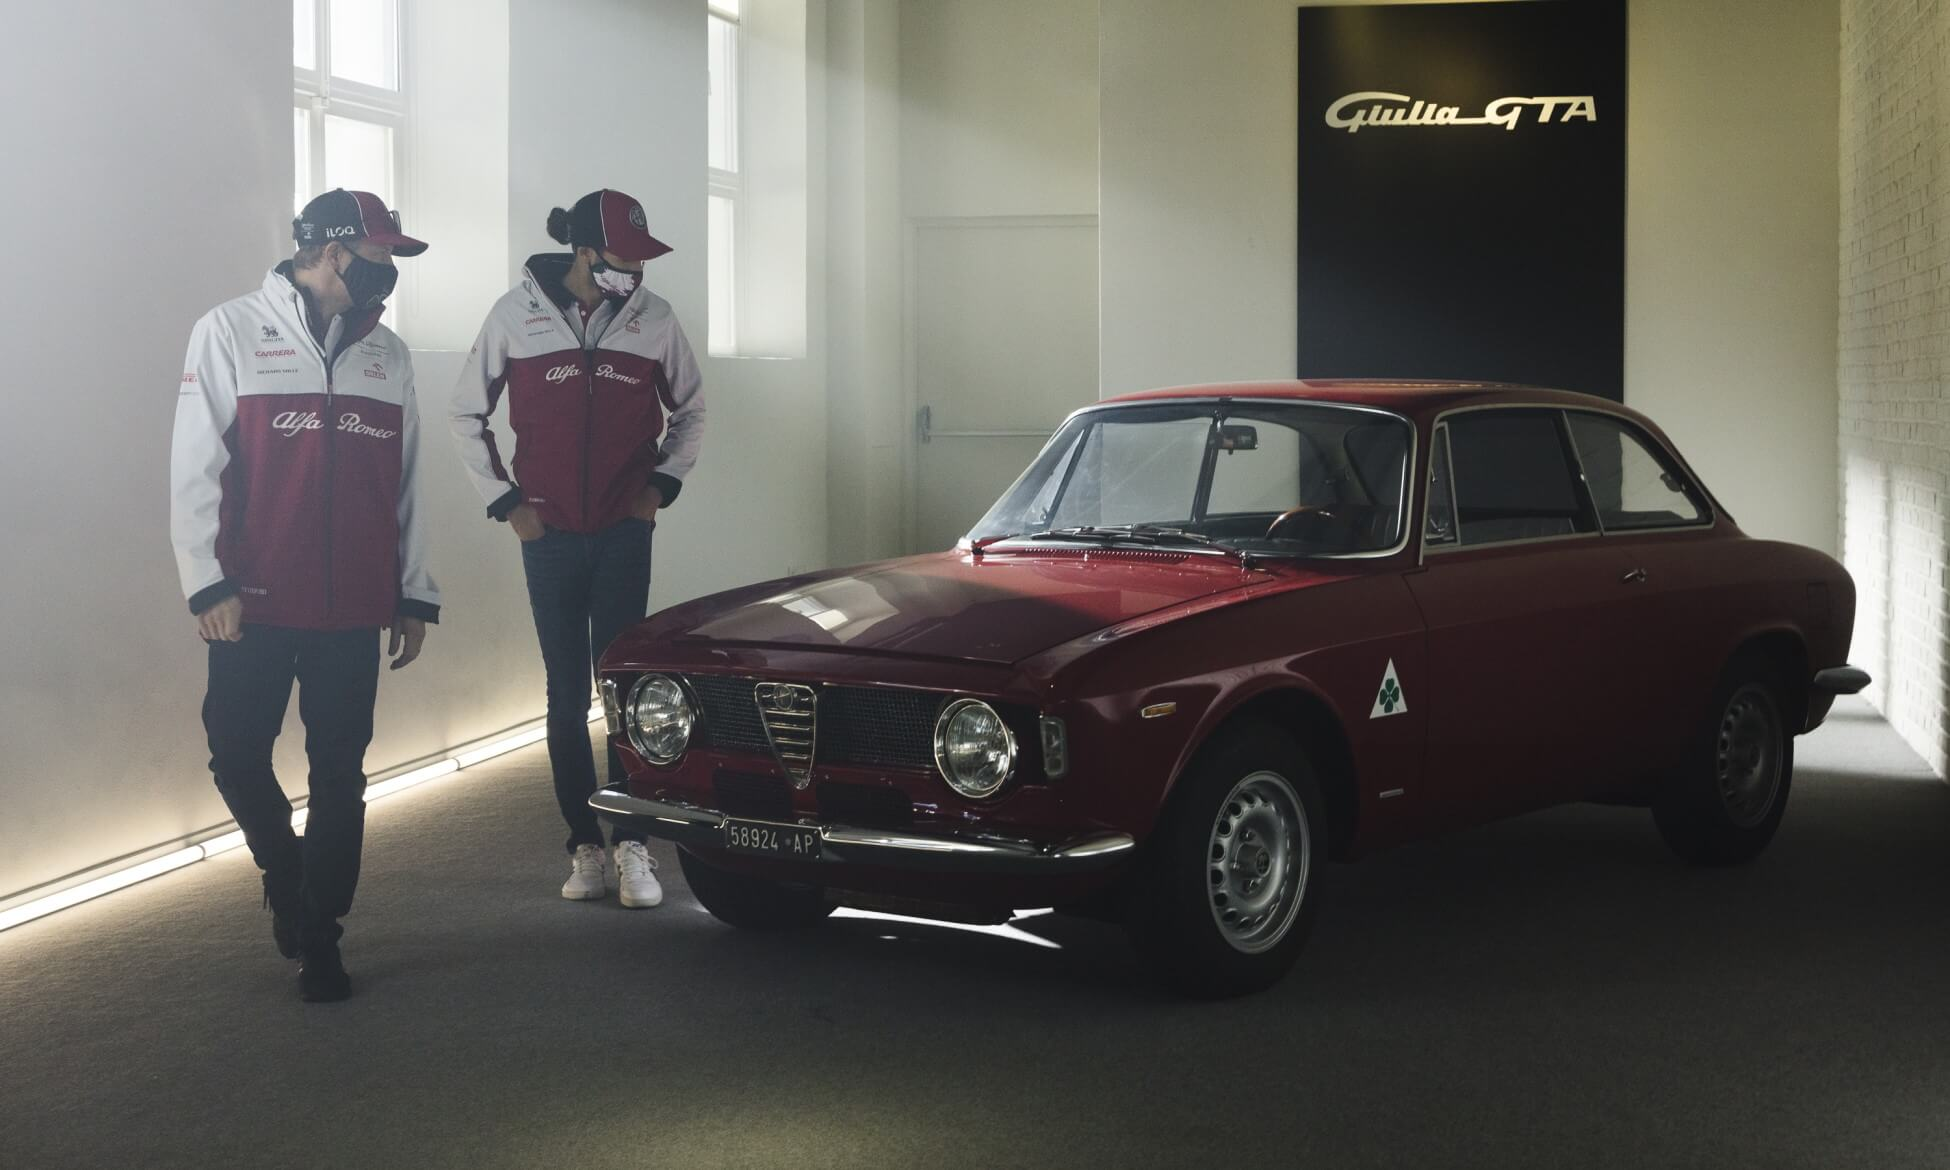 Alfa Romeo Giulia GTA Testing with F1 drivers